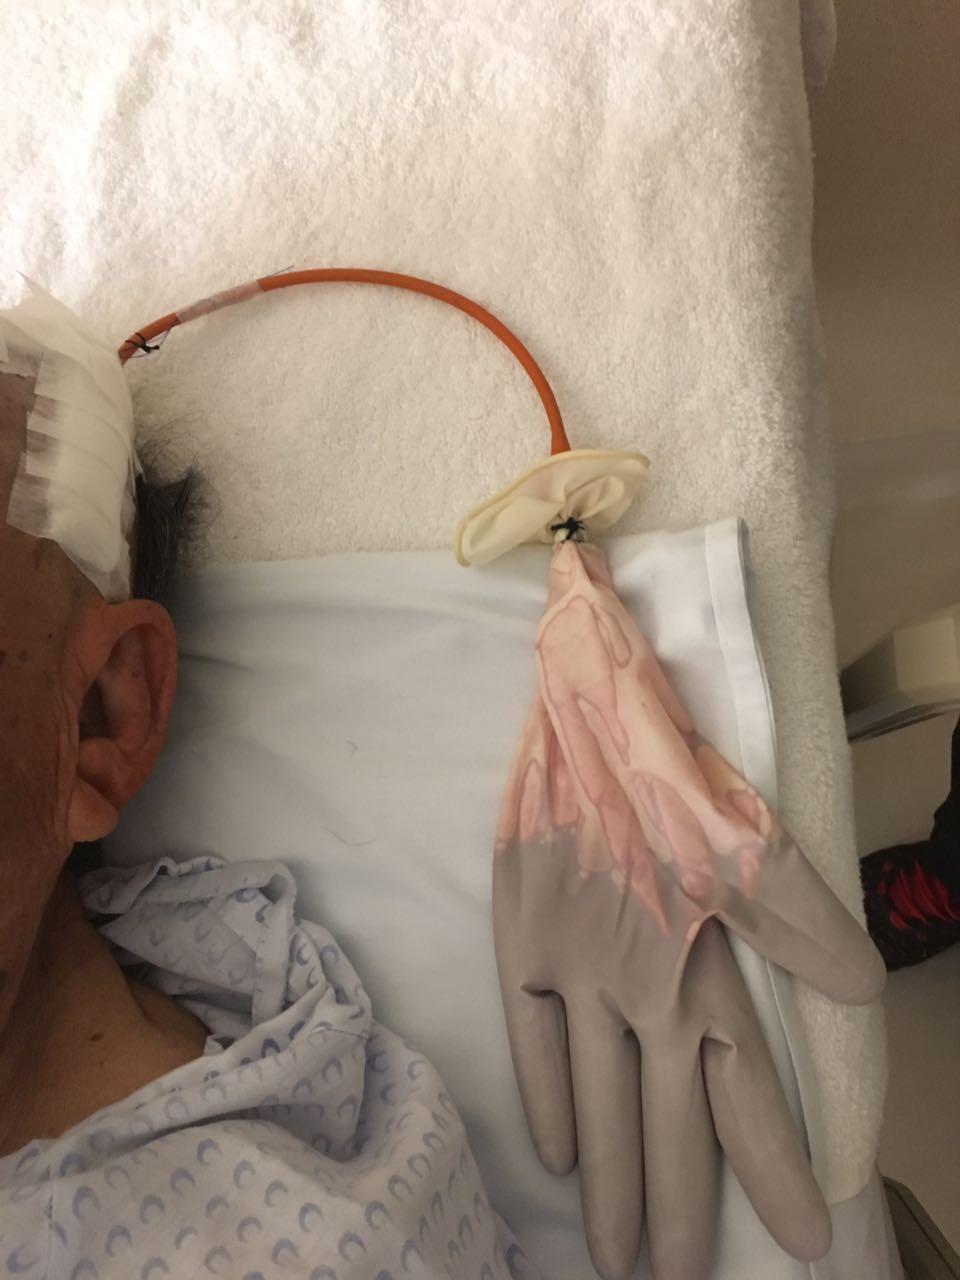 A Nelson catheter alternative for hematoma drainage